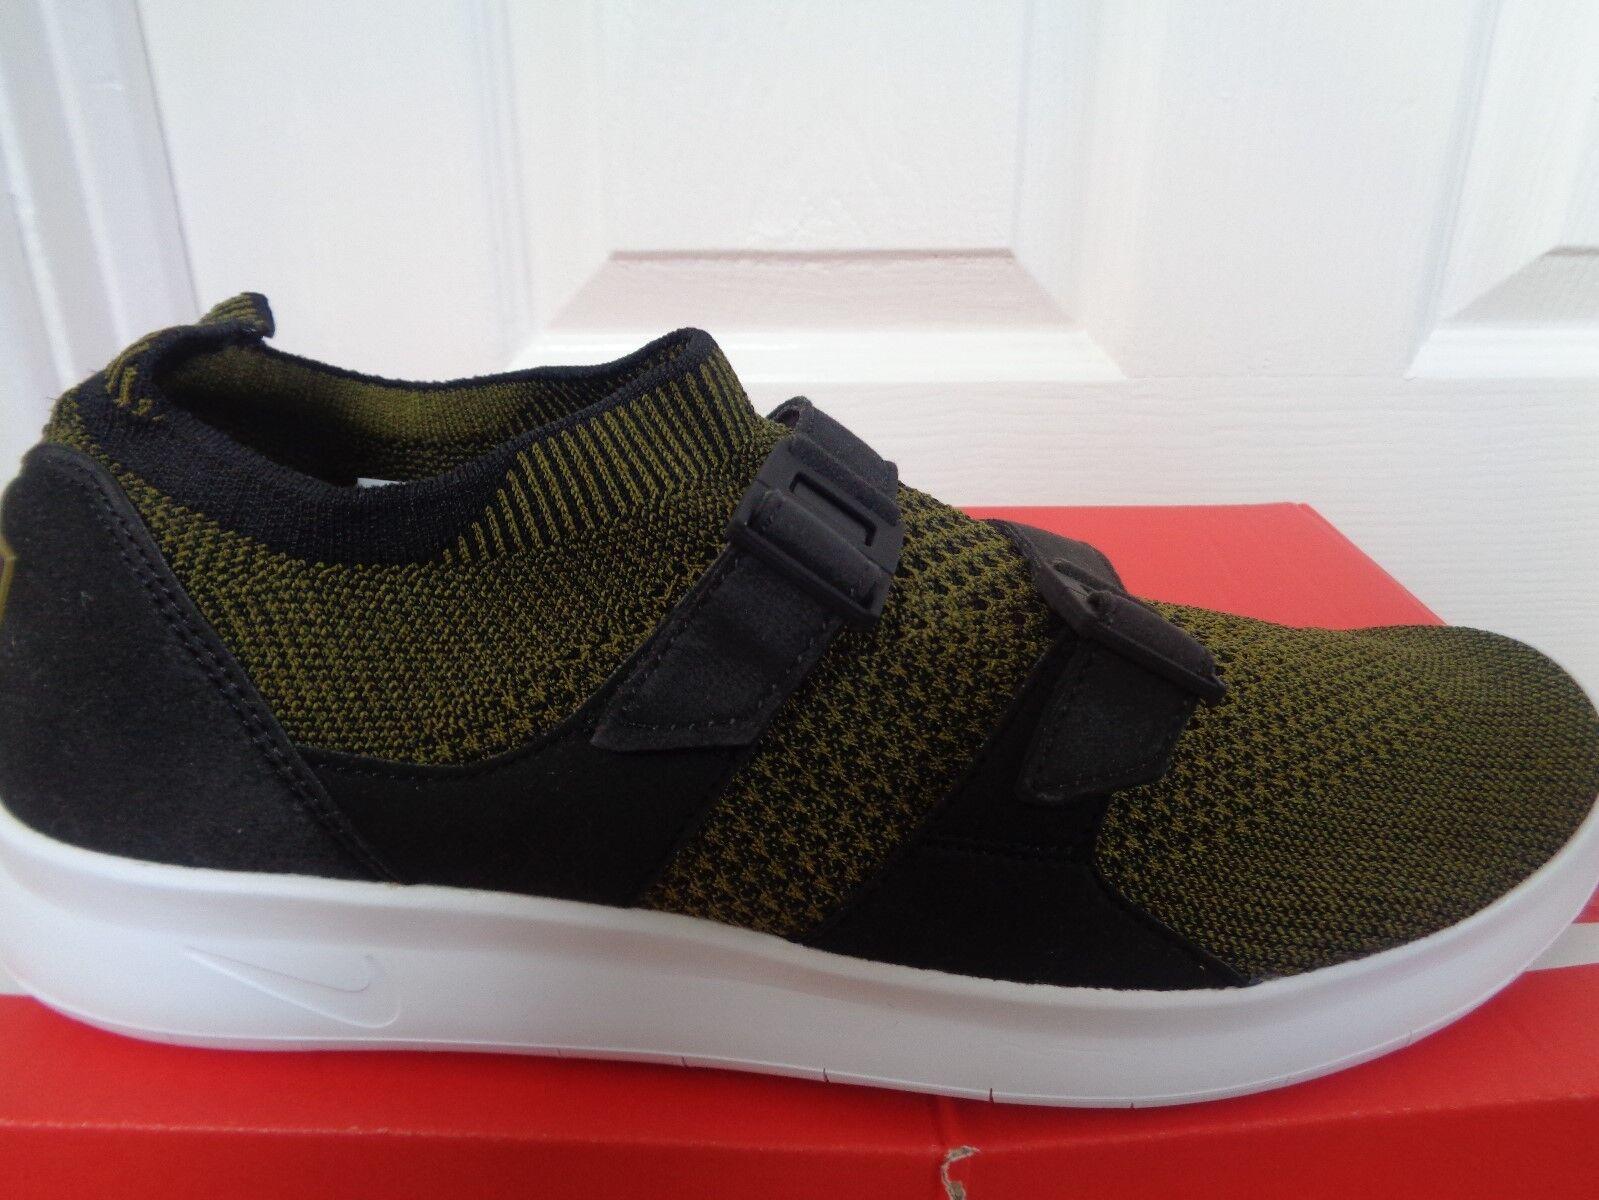 Nike Air Sockracer Flyknit mens trainers 898022 002 eu 42 us 8.5 NEW+BOX